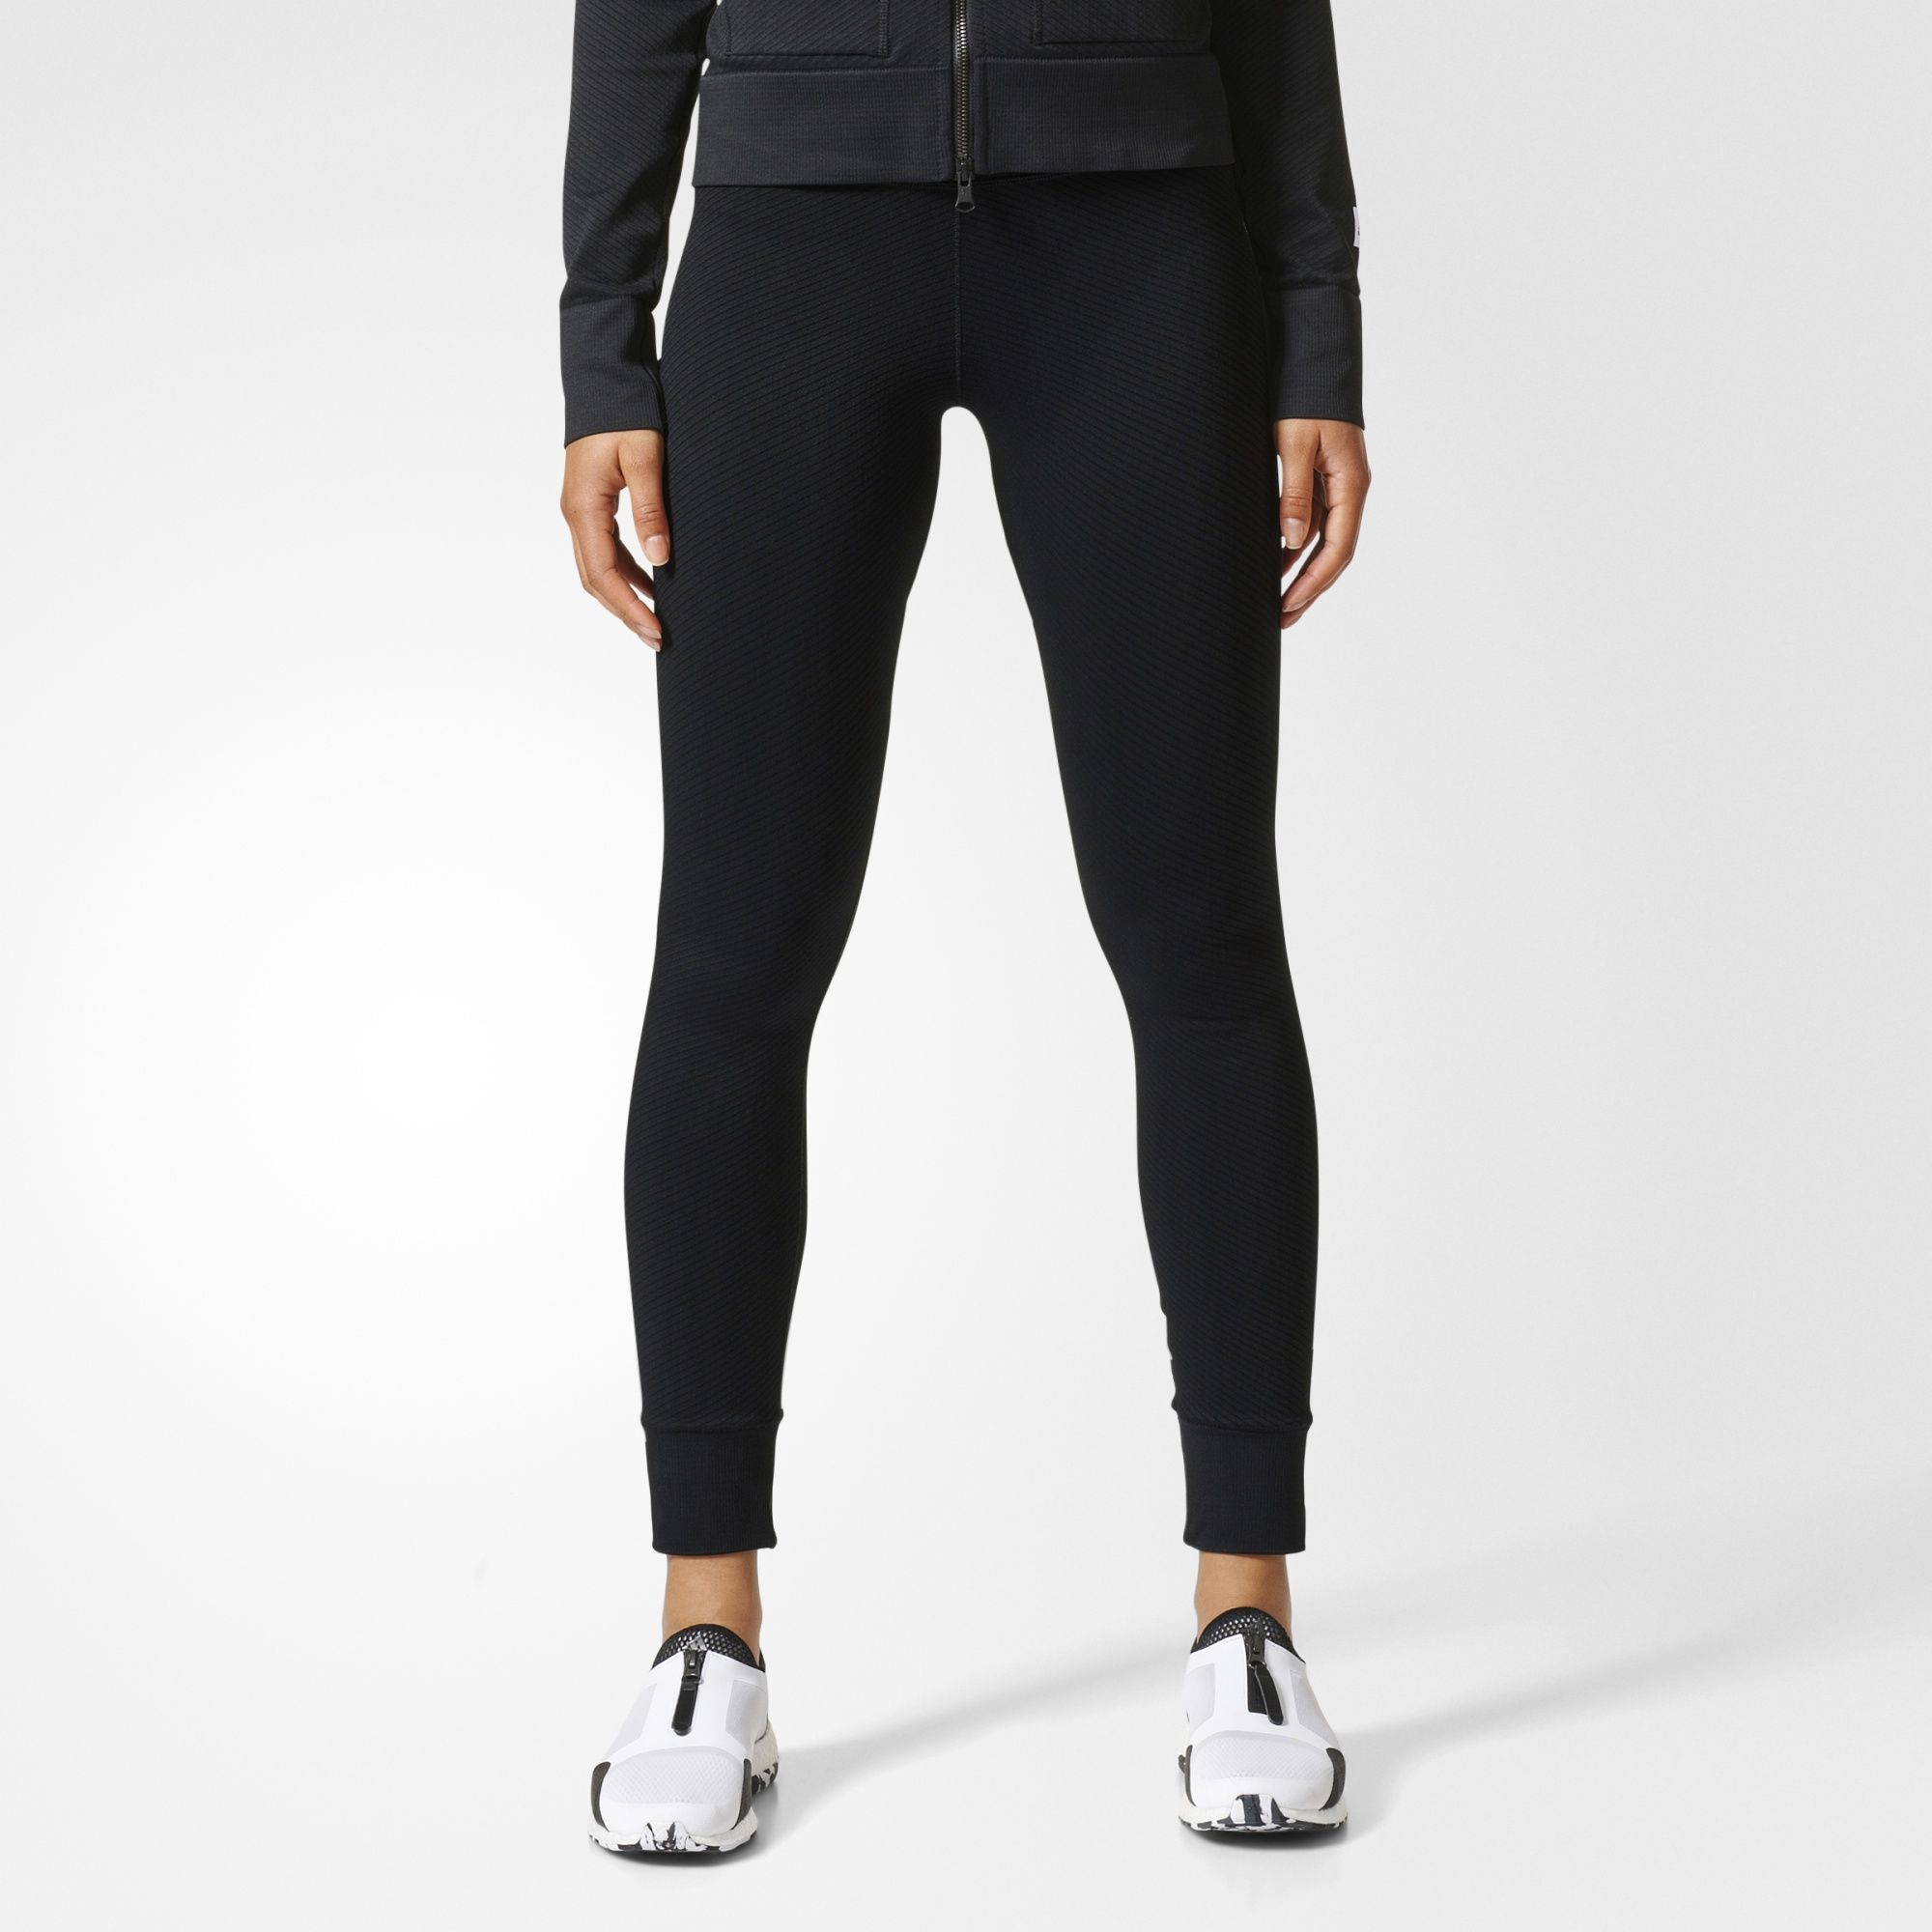 Adidas UK Shop - Adidas Athletics x Reigning Champ Primeknit Tights (Black) for Women